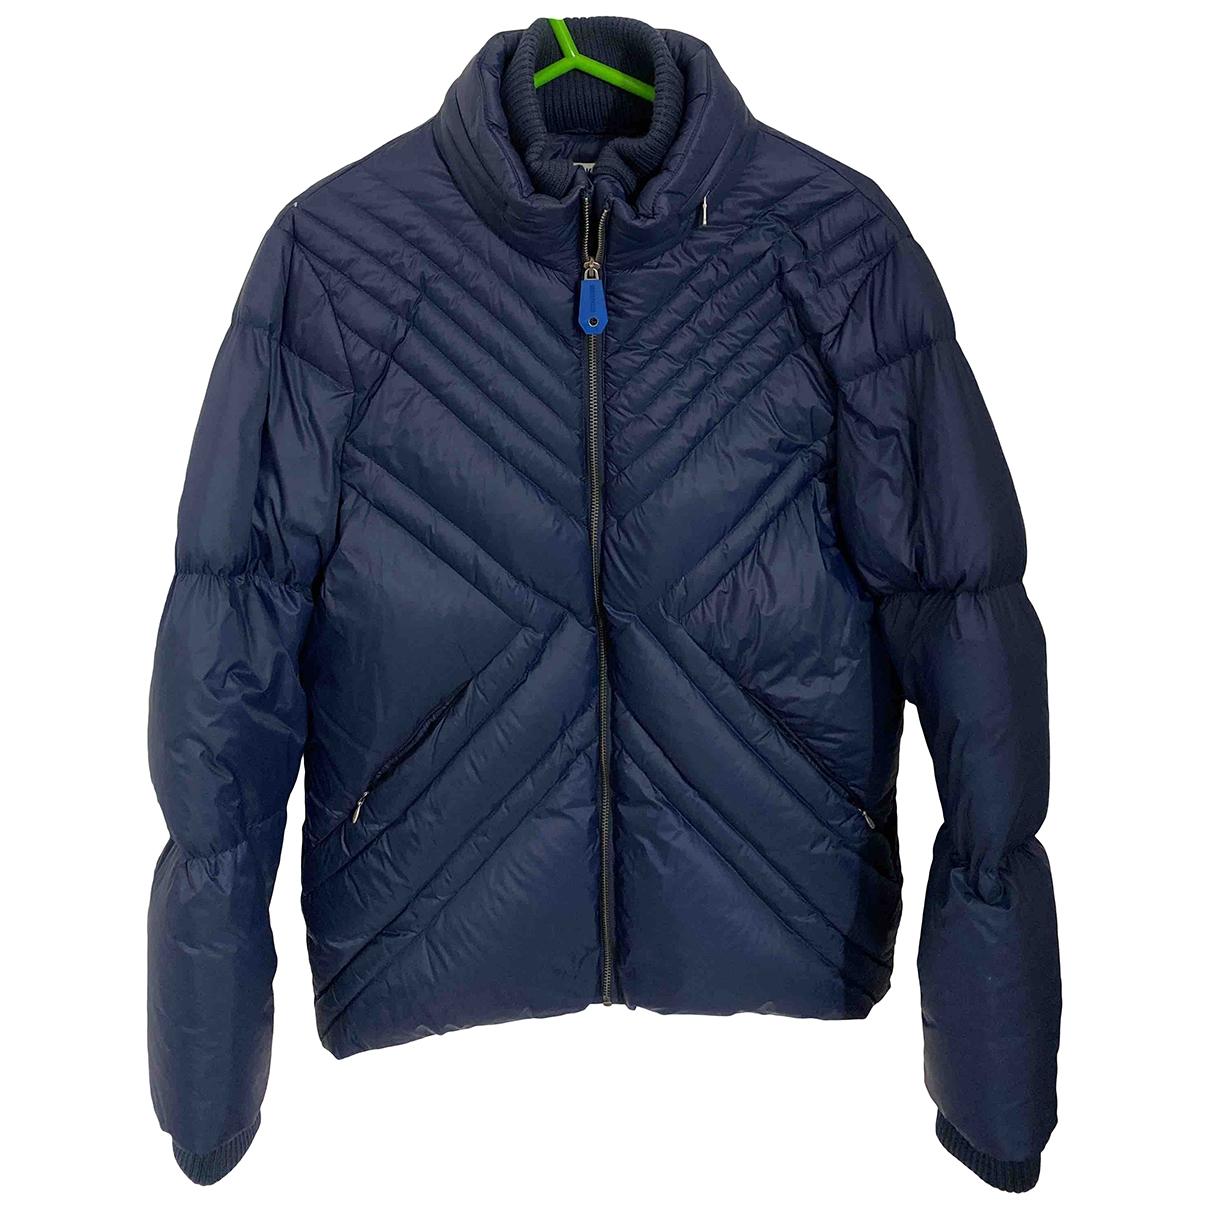 Dirk Bikkembergs \N Blue coat  for Men 44 IT